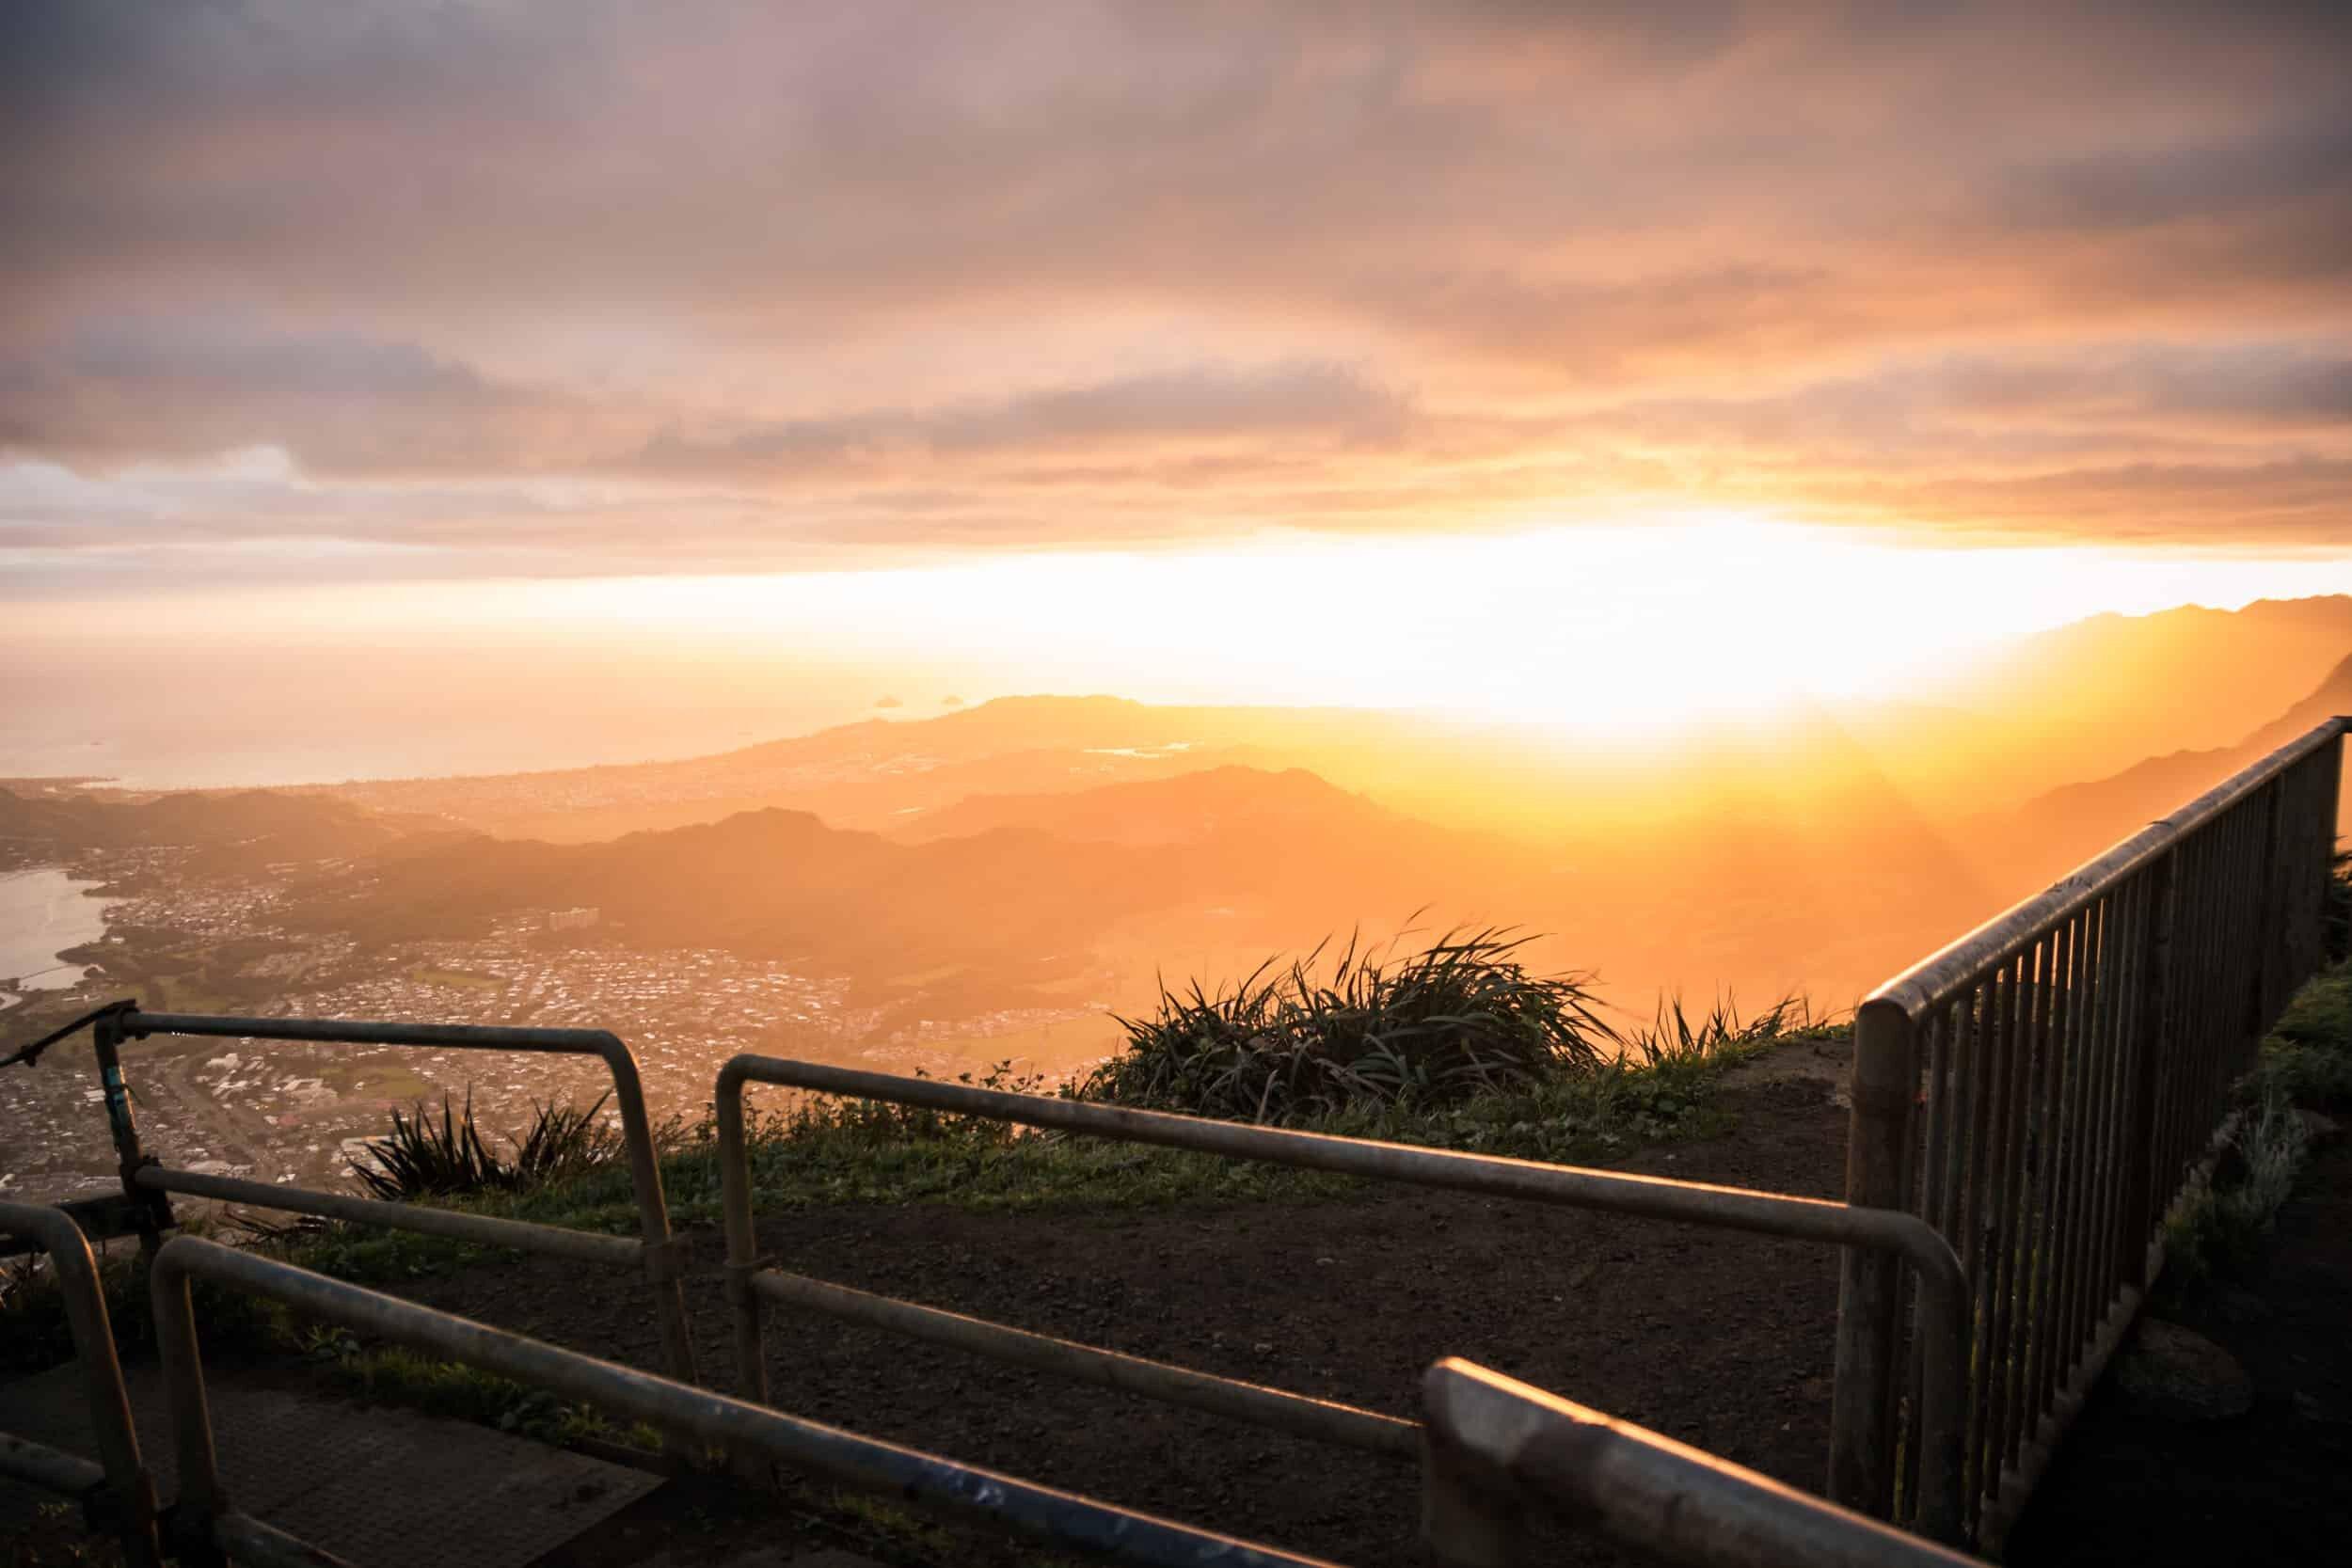 Stairway to Heaven, Oahu Elopement Location 2